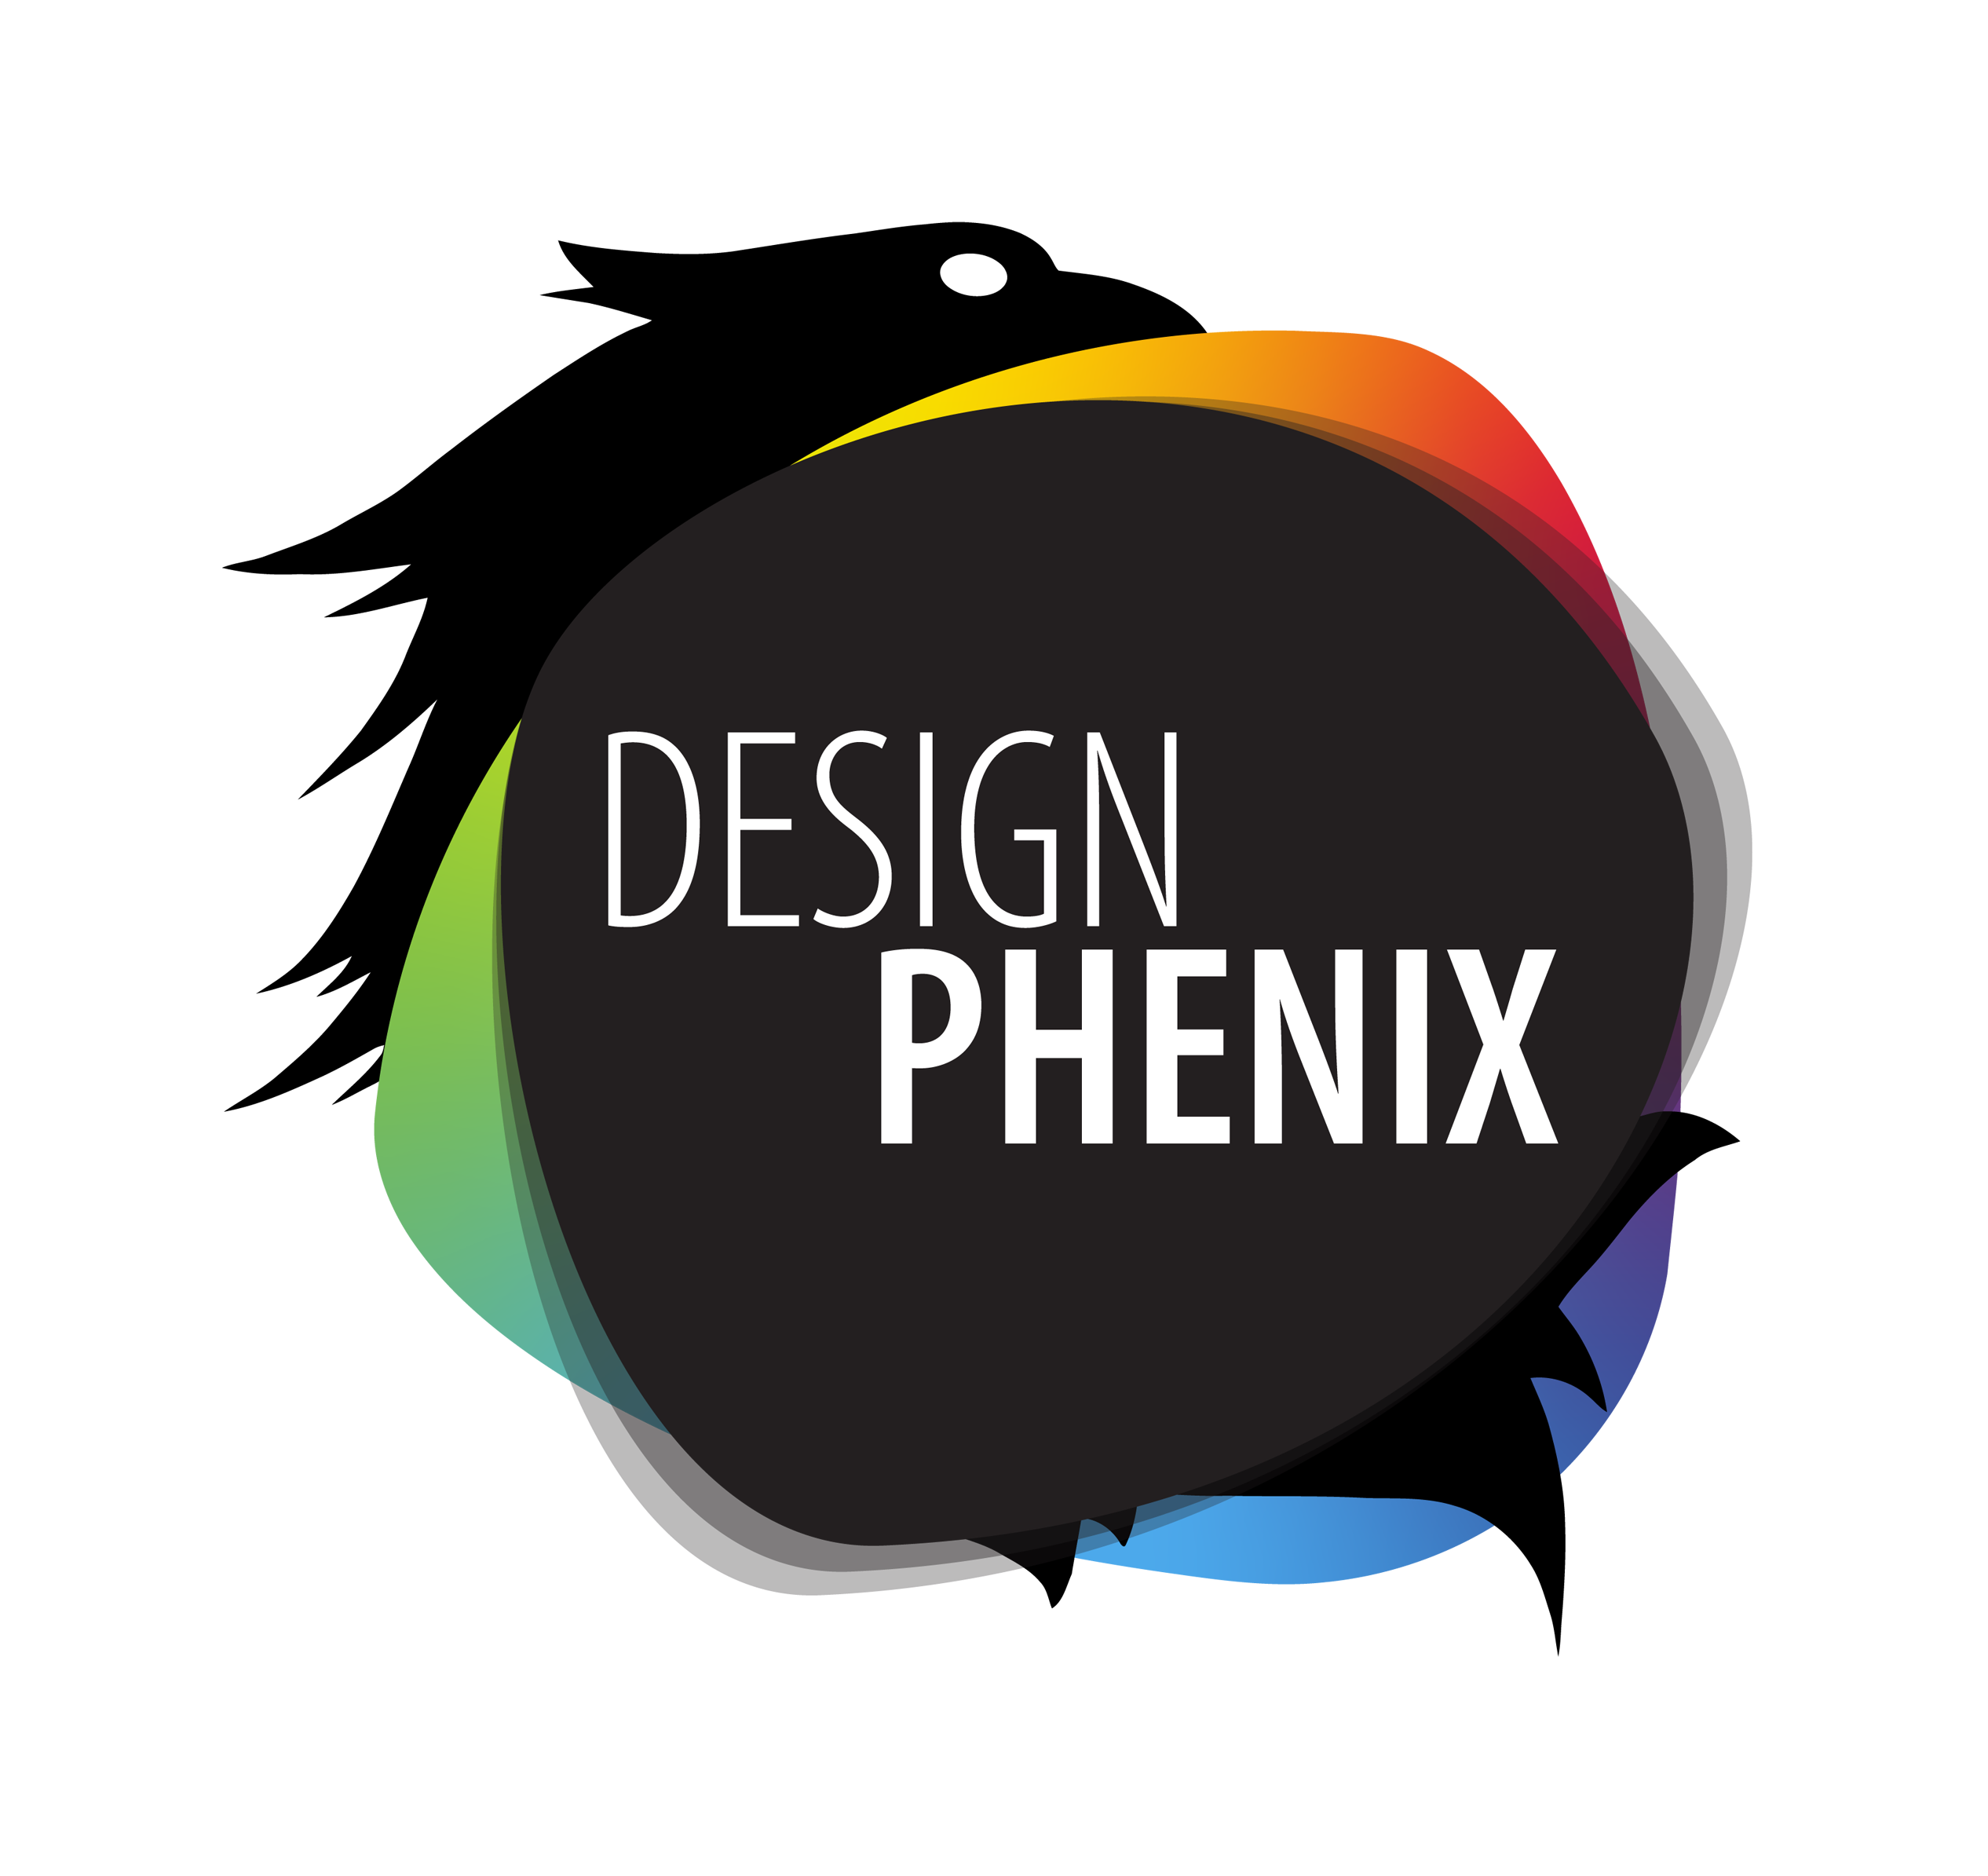 Logo Design Phénix